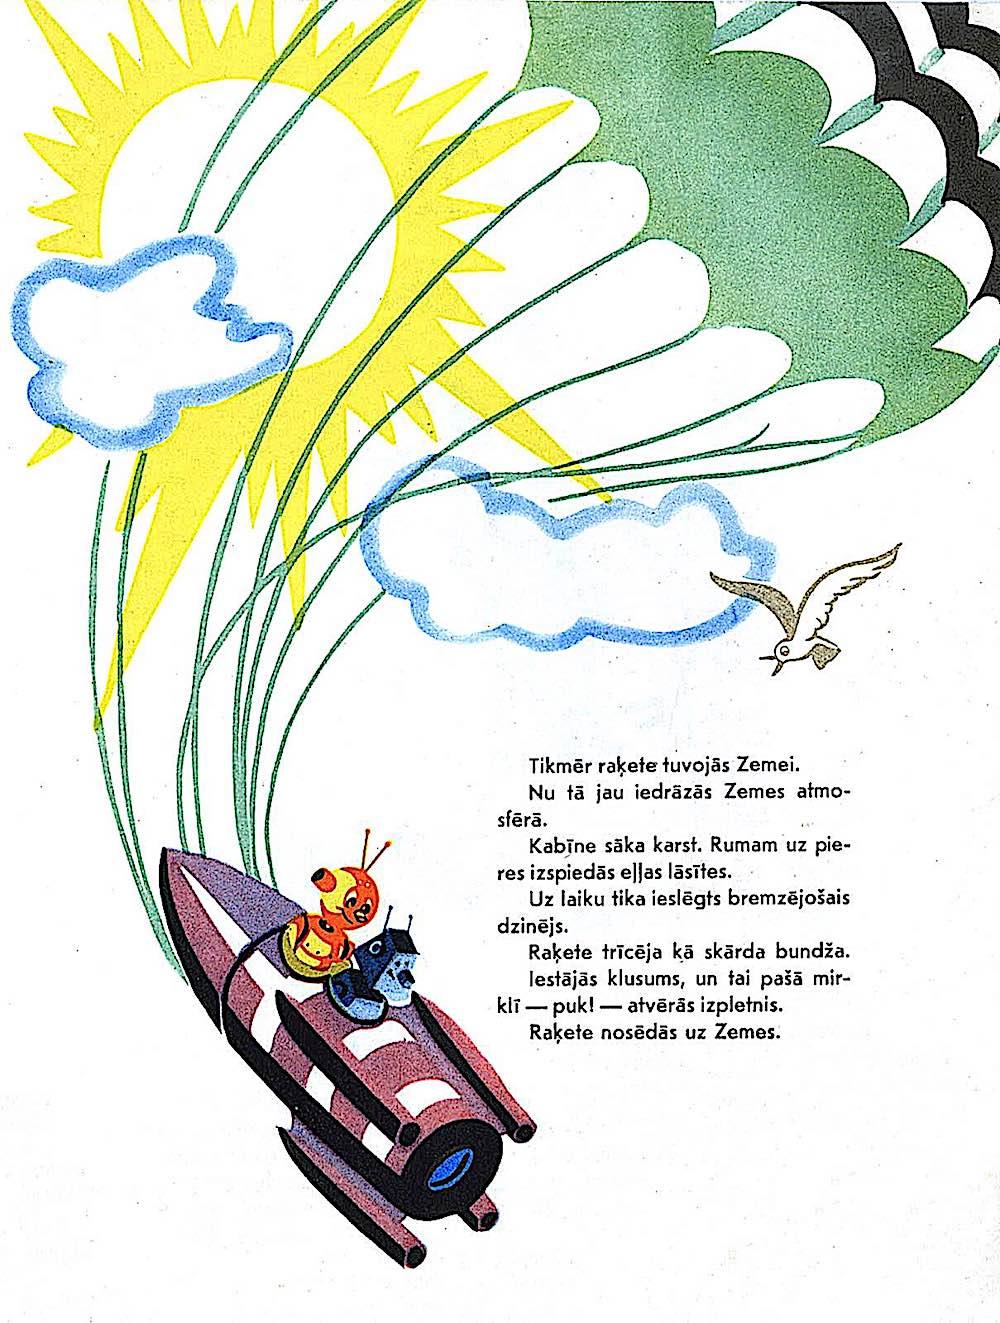 a children's book 1963 Russia, robots in space